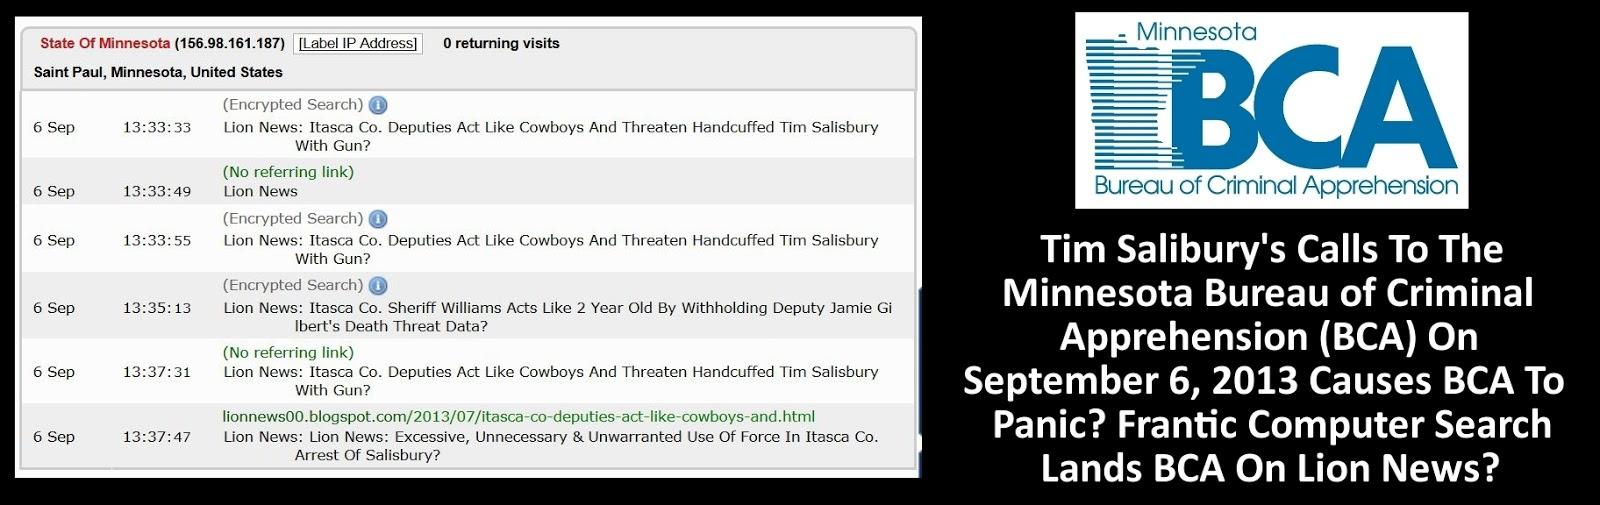 Lion news tim salisbury 39 s 09 06 13 complaint filed with the minnesota bureau of criminal - Criminal bureau of investigation mn ...